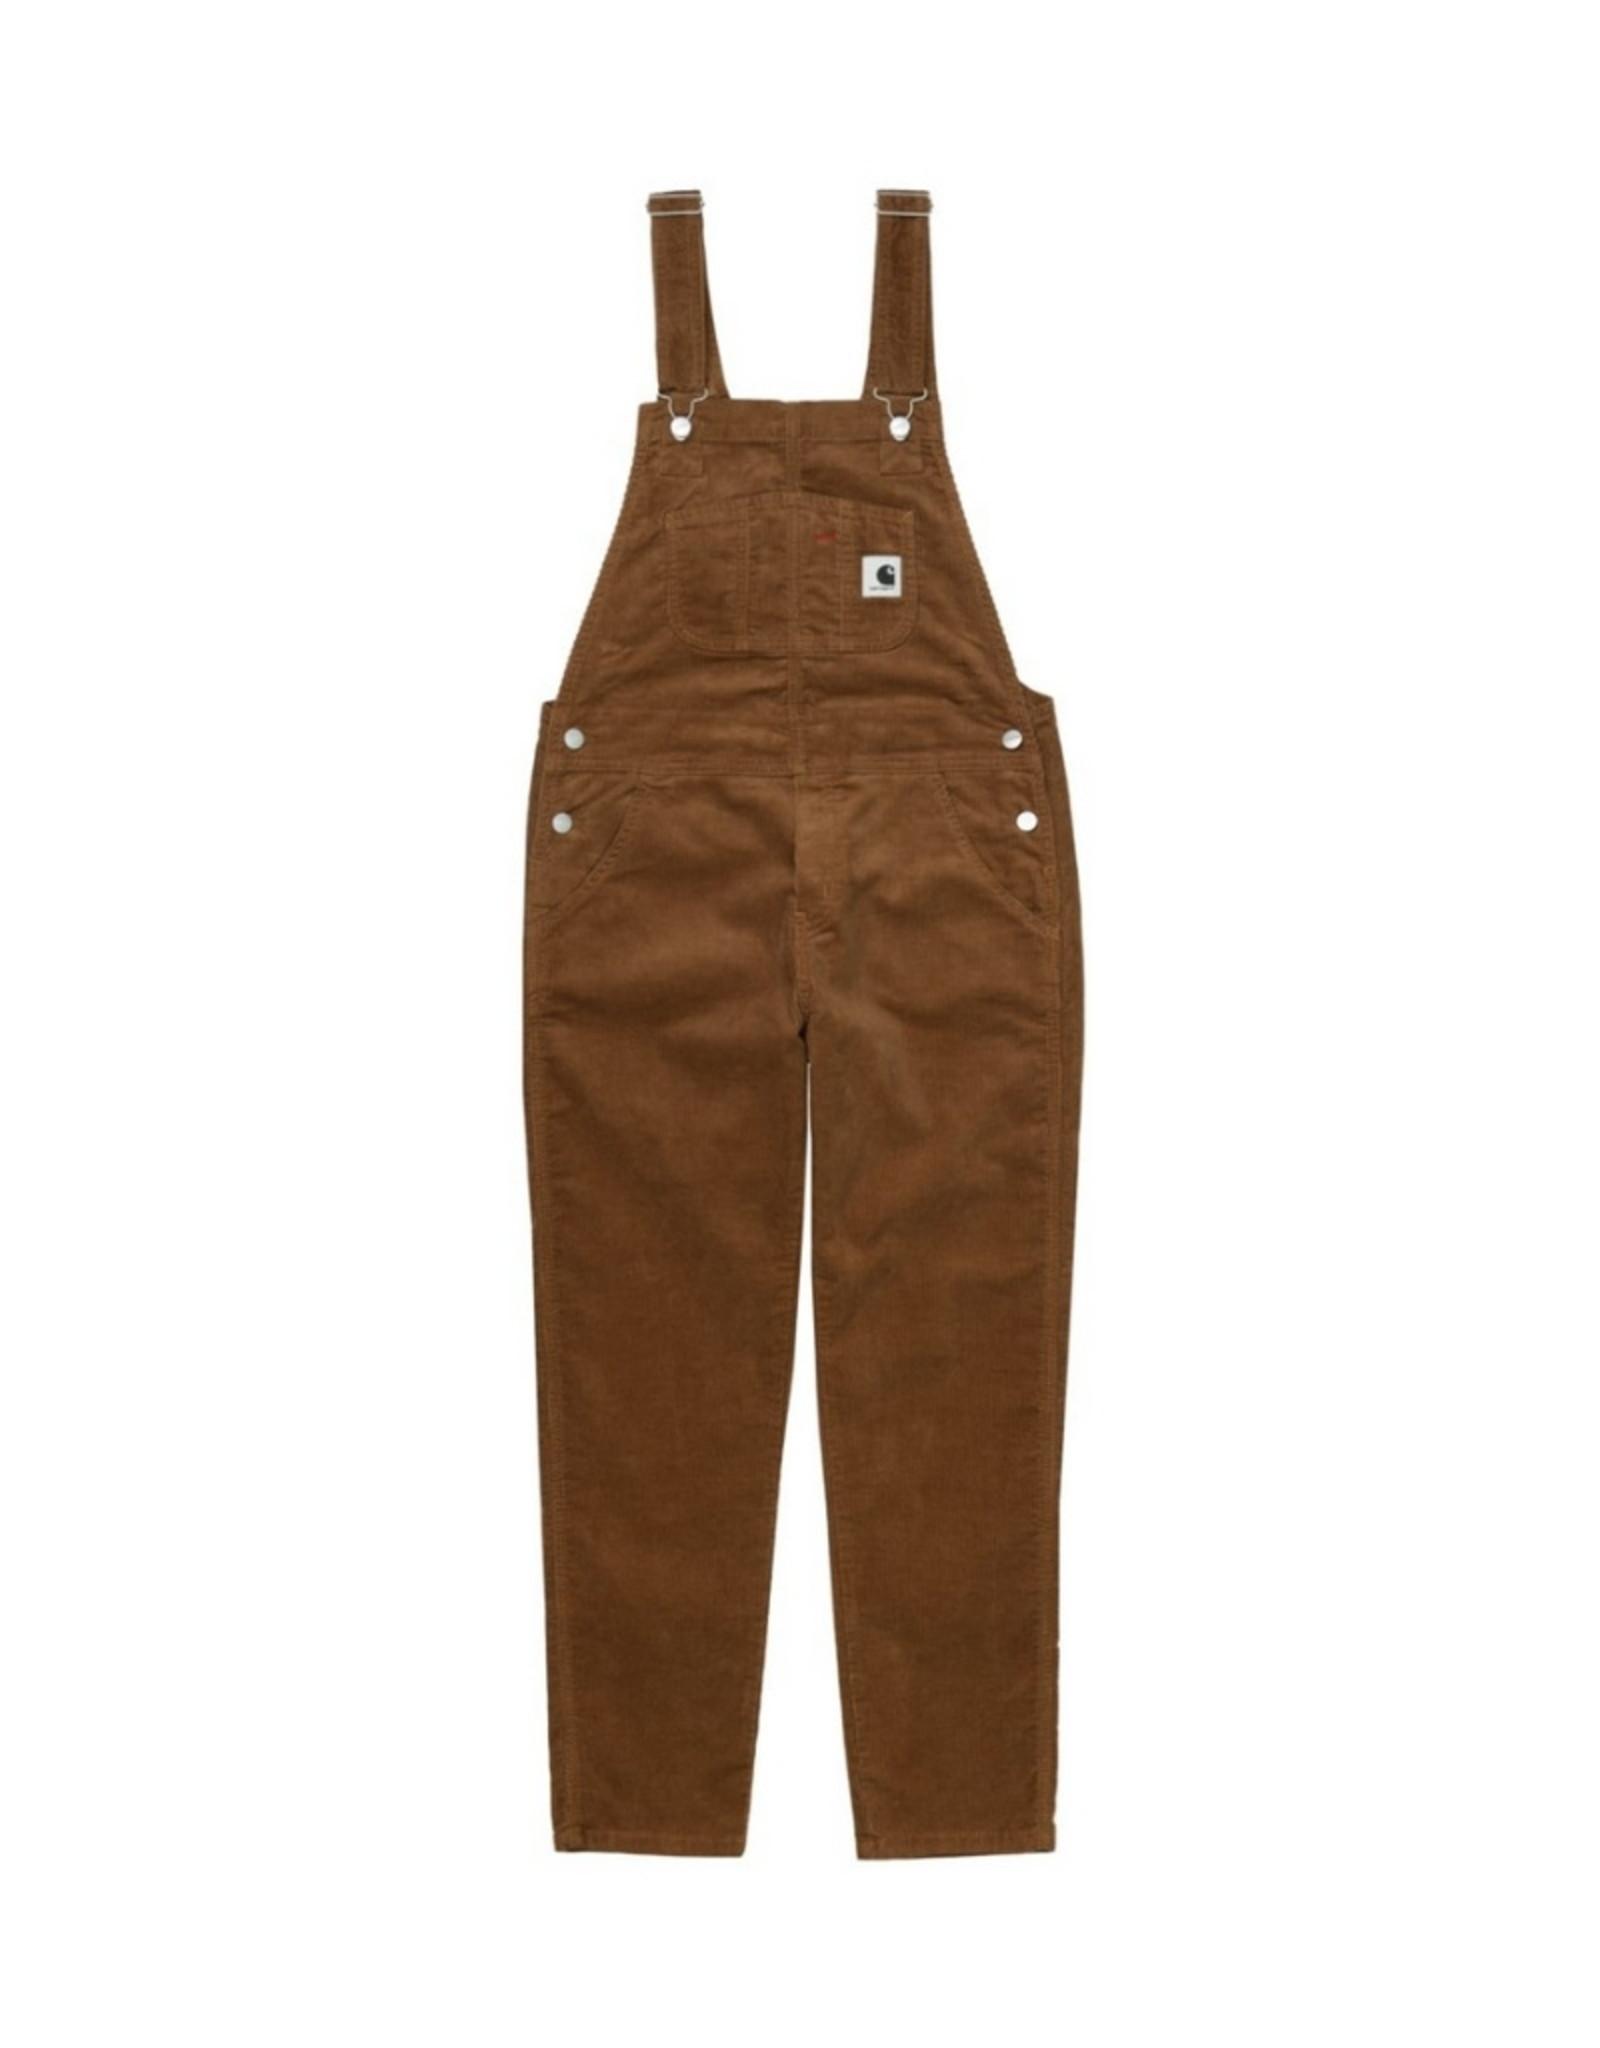 Carhartt - W BIB OVERALL CORDUROY / hamilton brown rinsed